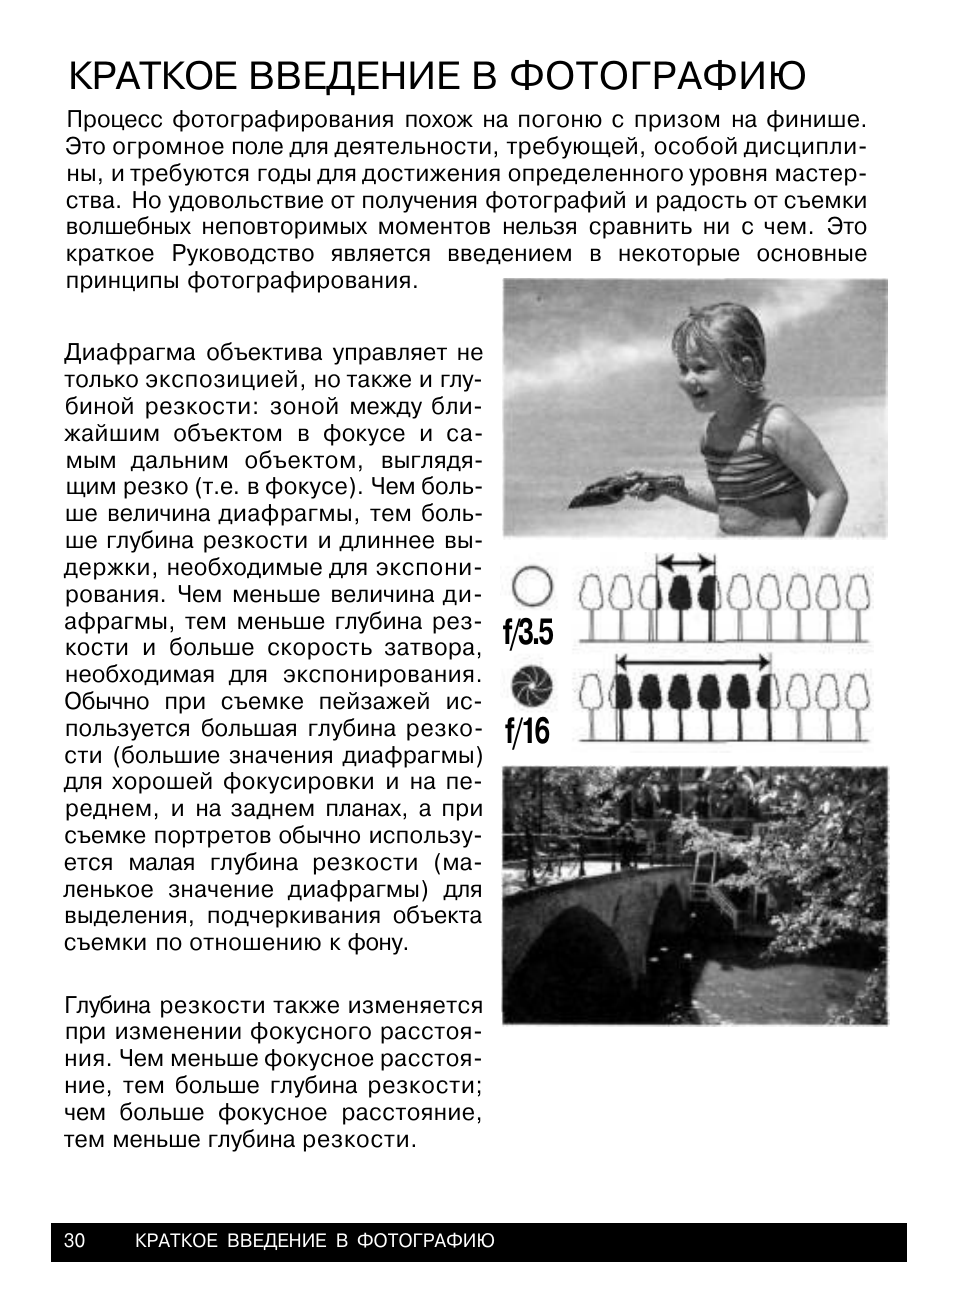 Minolta dynax 60 инструкция